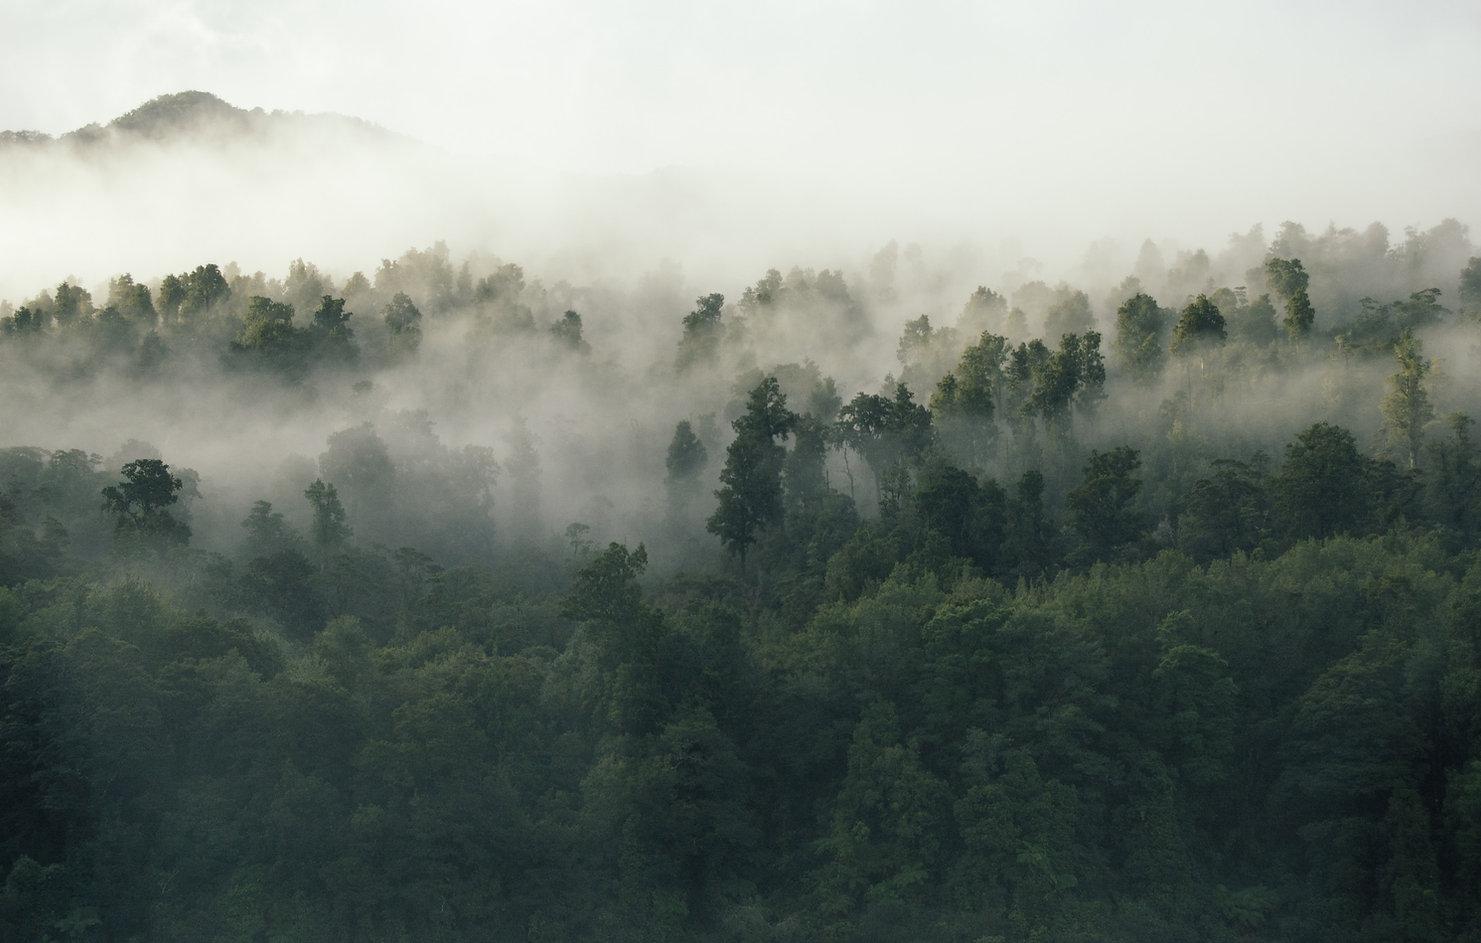 Image by Tobias Tullius